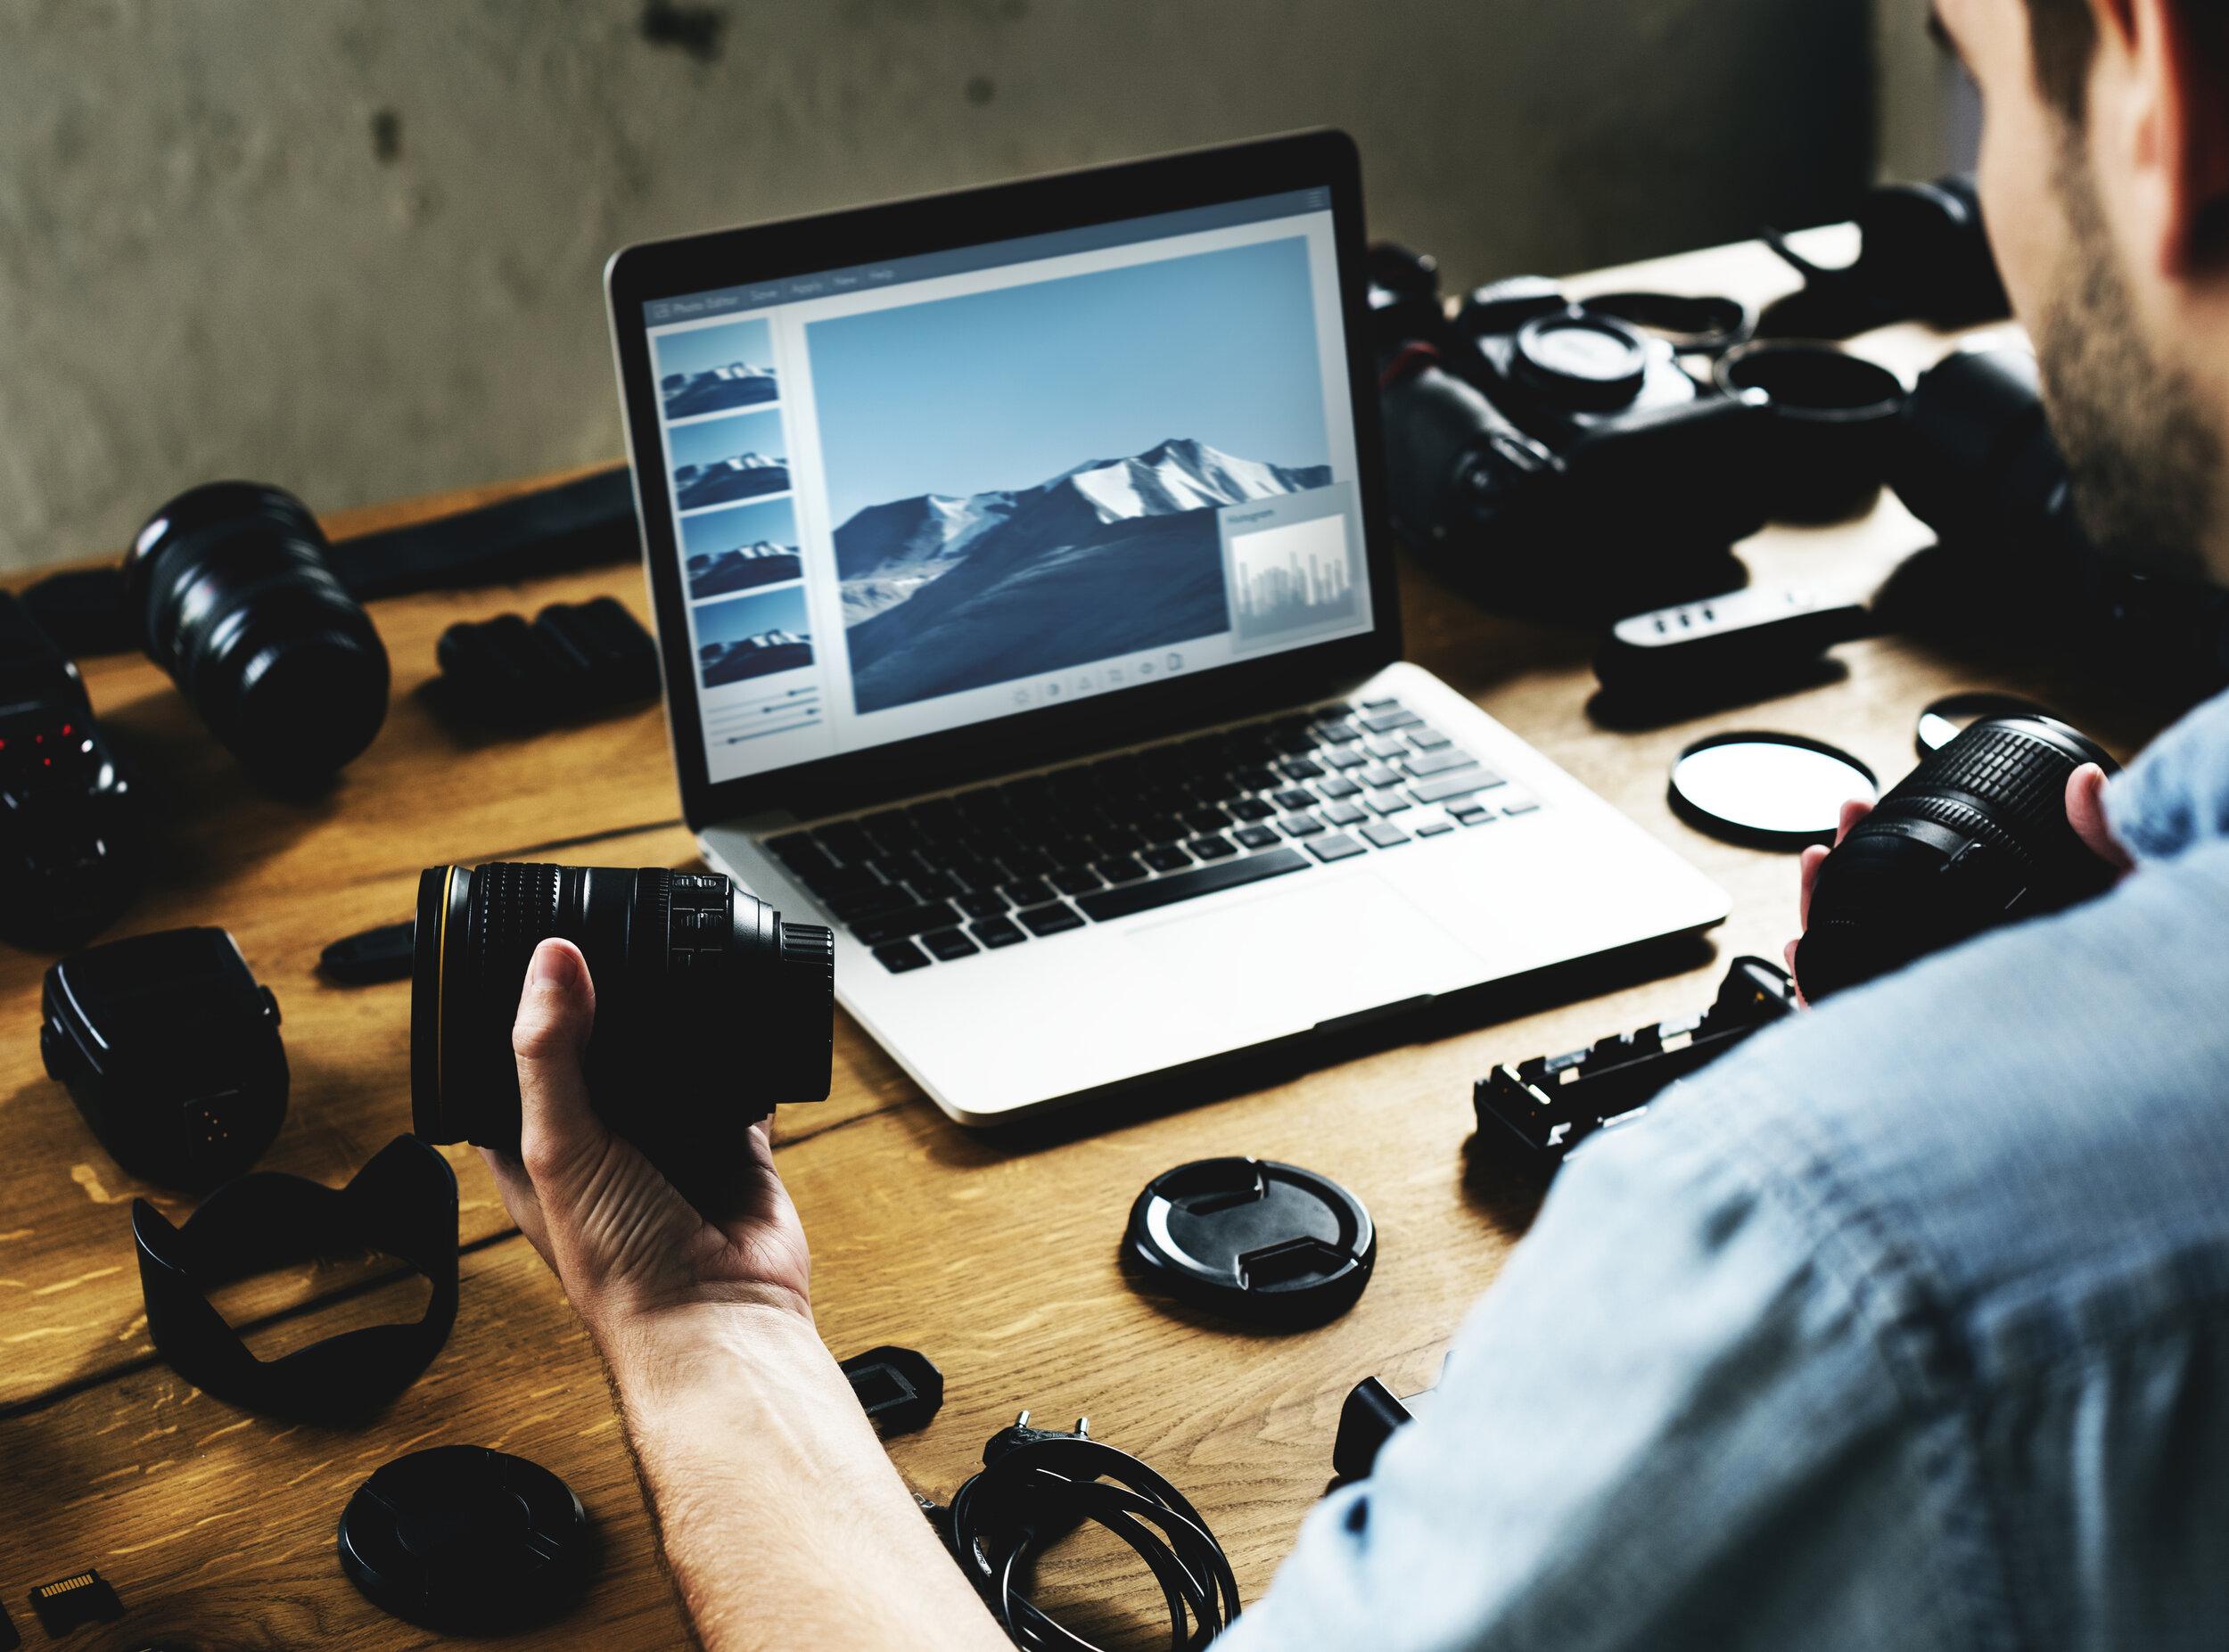 photographer-with-camera-equipment-PKJAKQG.jpg